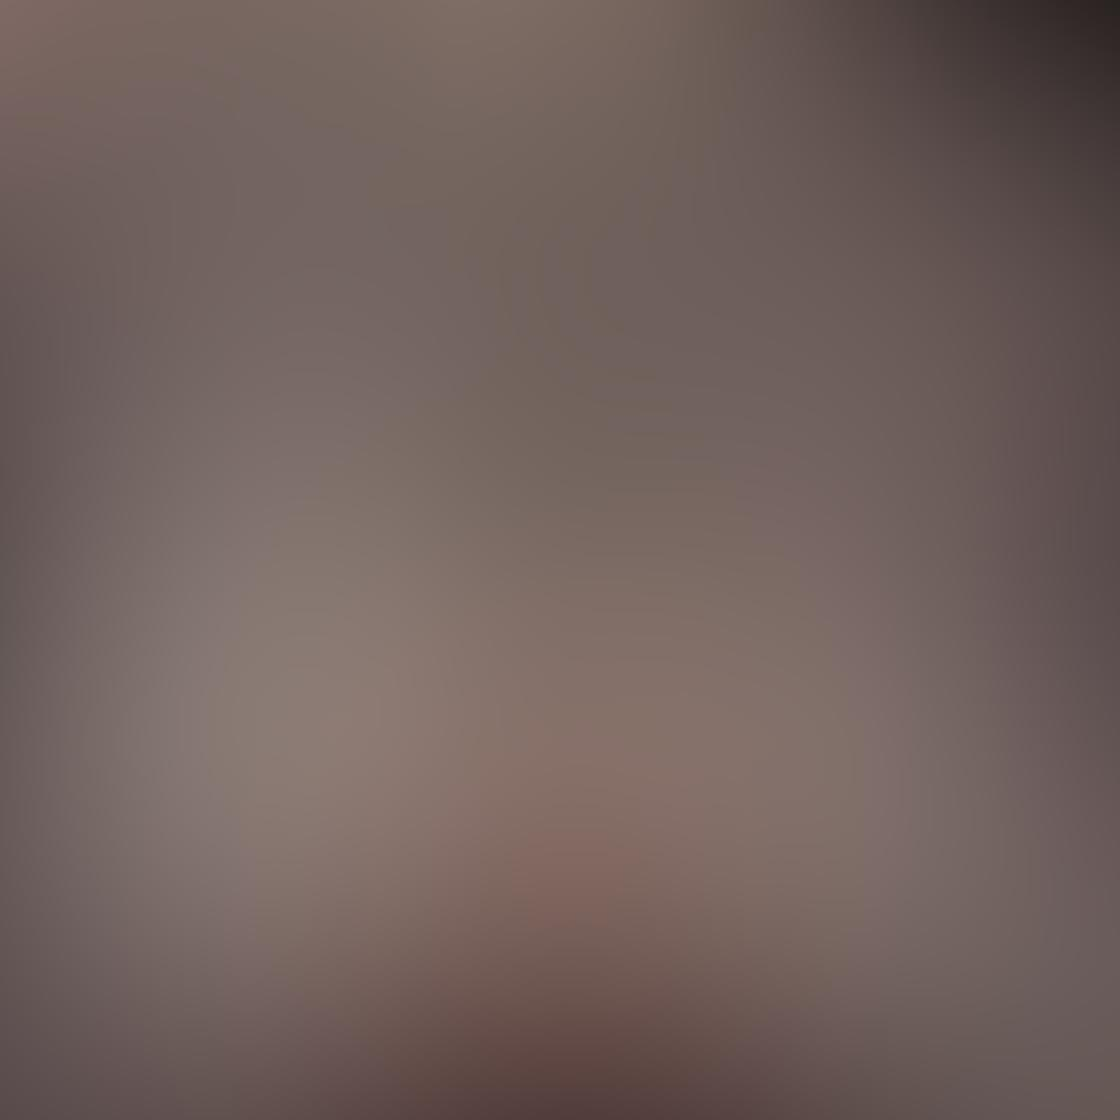 iPhone Angle Photo 21